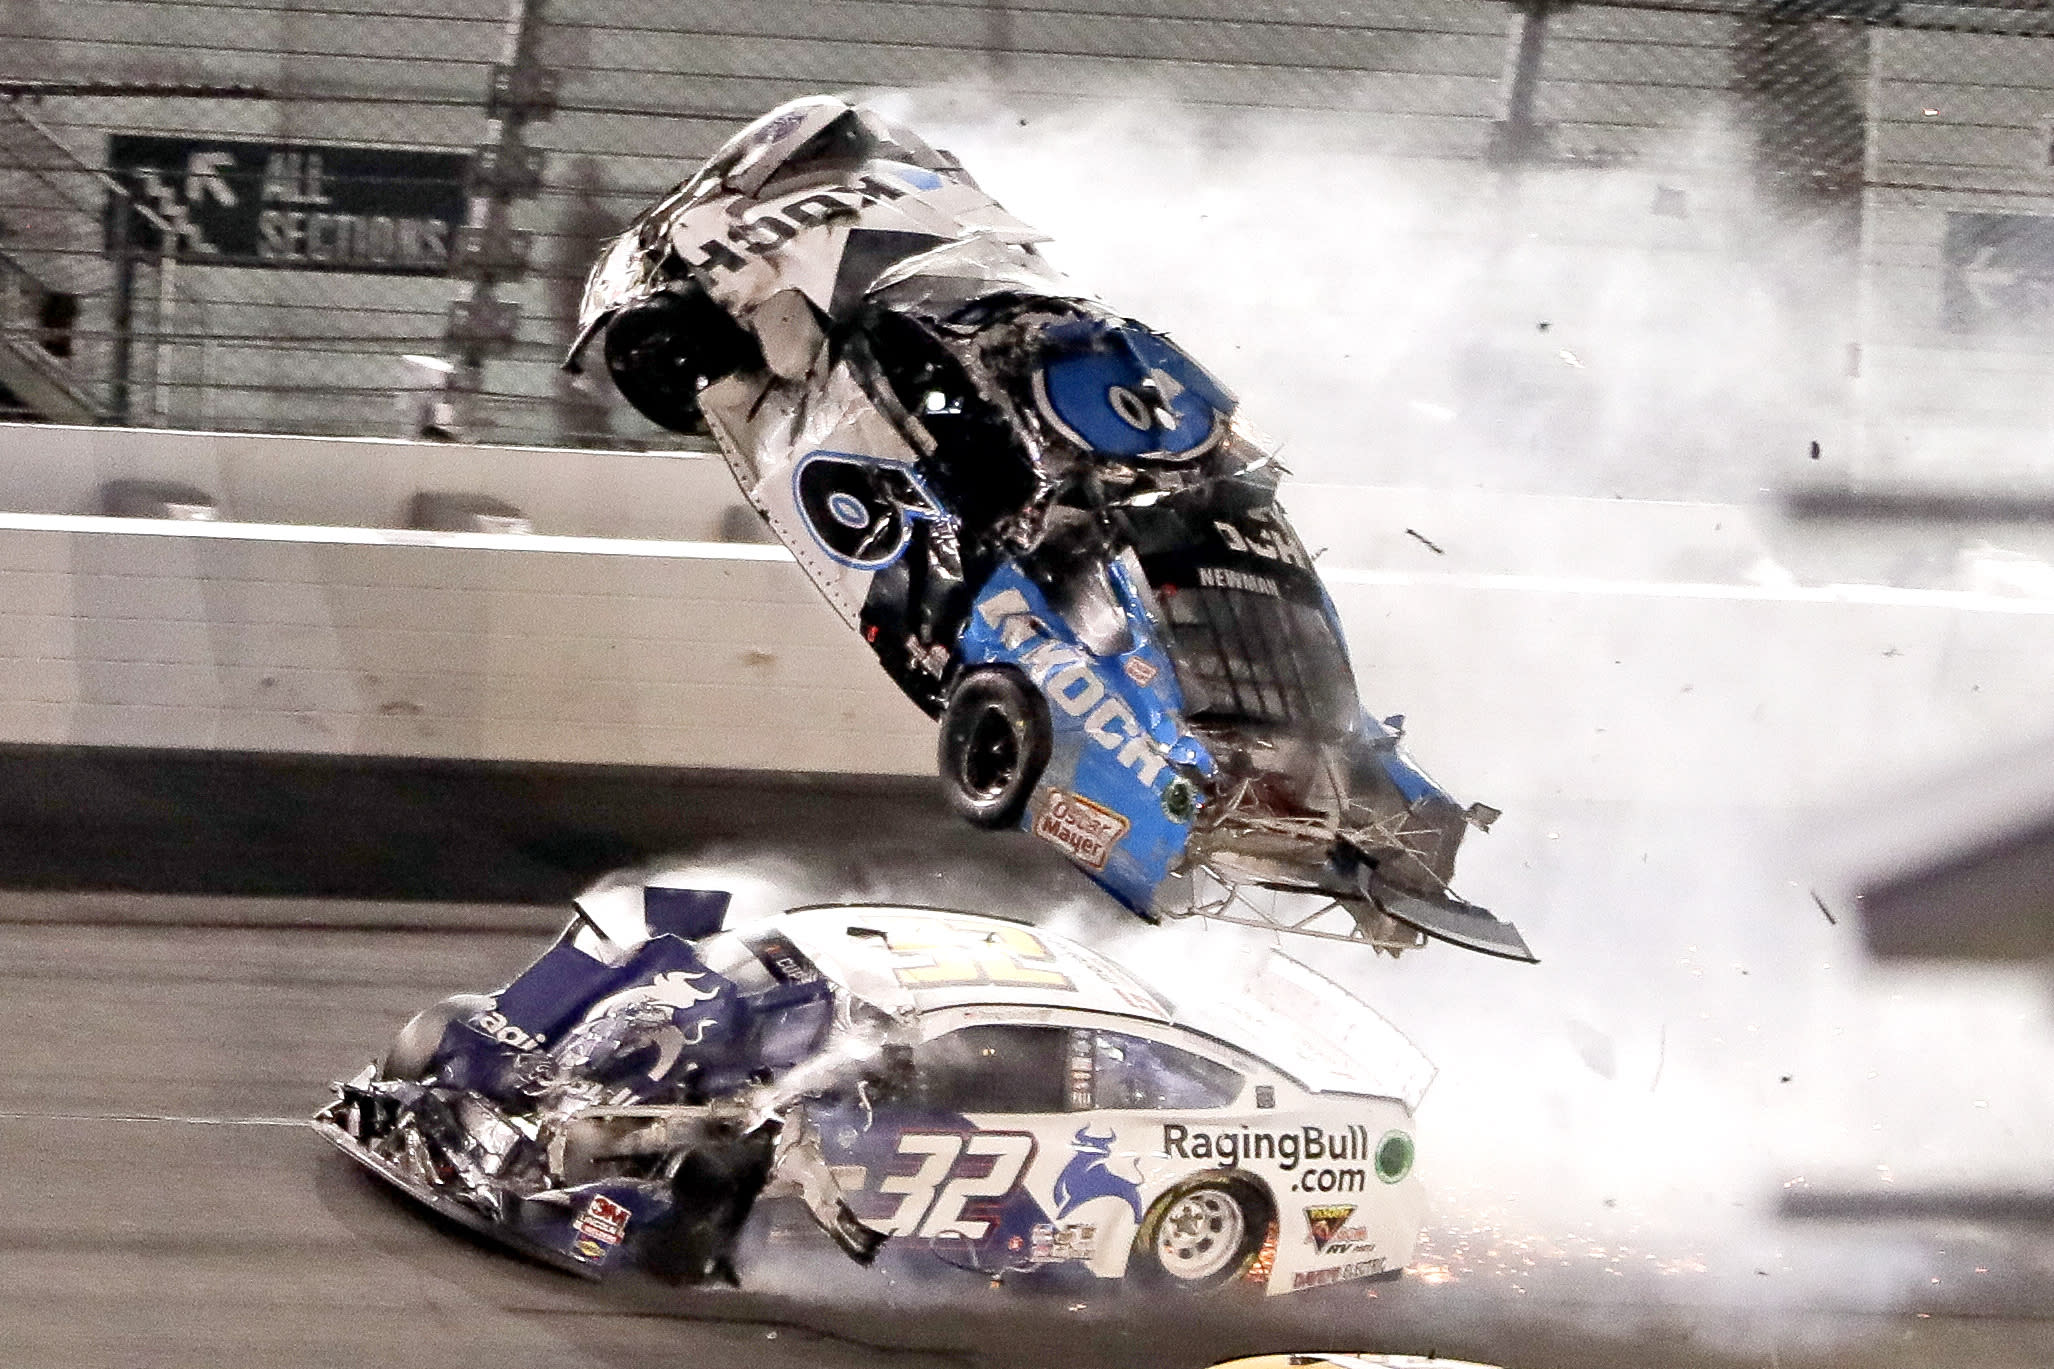 NASCAR Daytona 500 auto race at Daytona International Speedway, Monday, Feb. 17, 2020, in Daytona Beach, Fla. Sunday's race was postponed because of rain. (AP Photo/John Raoux)